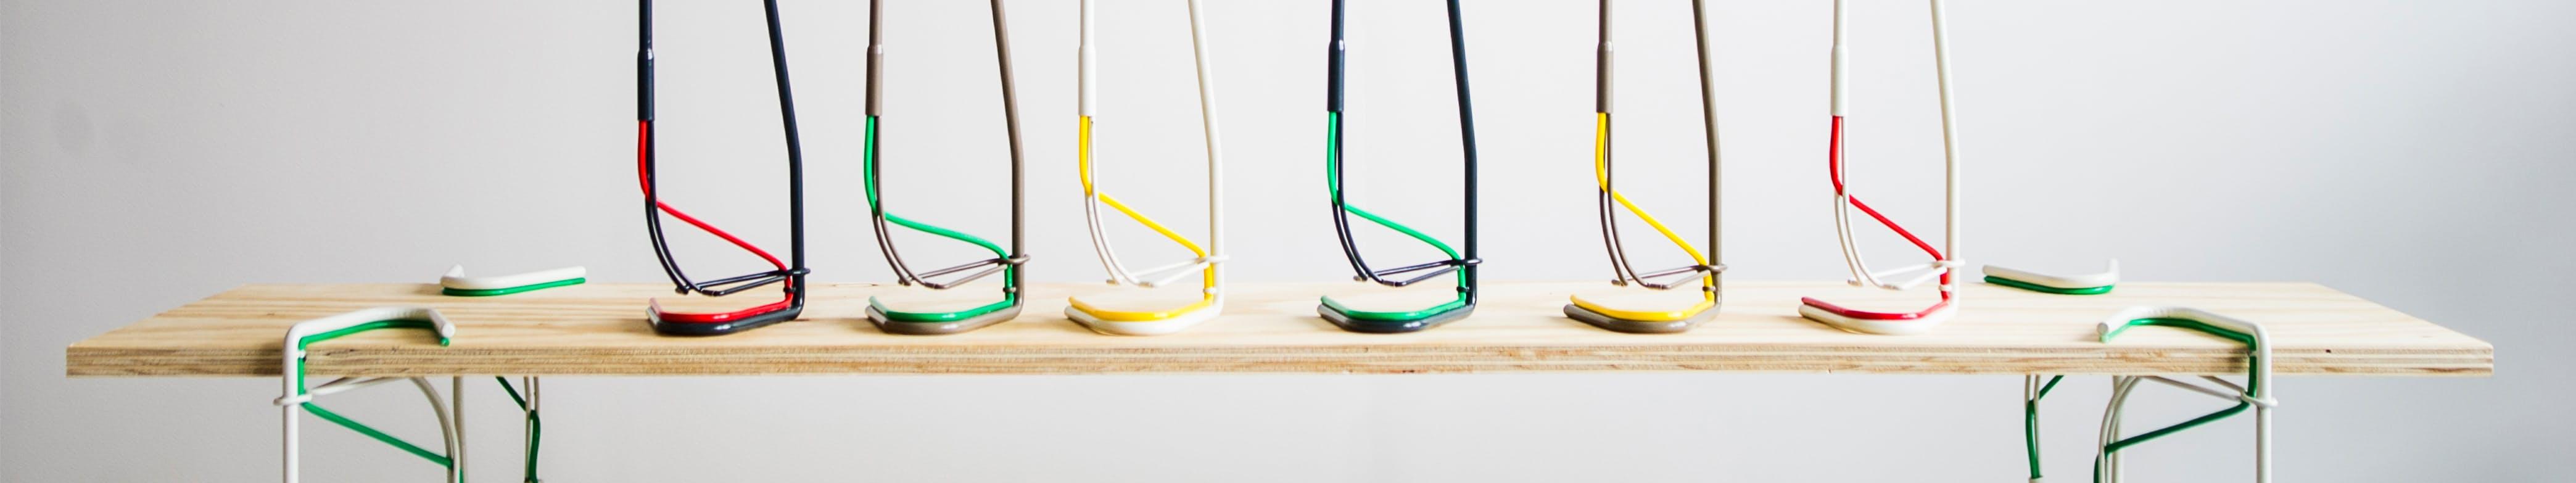 Snap by be elastic photos   header.jpg?ixlib=rails 2.1